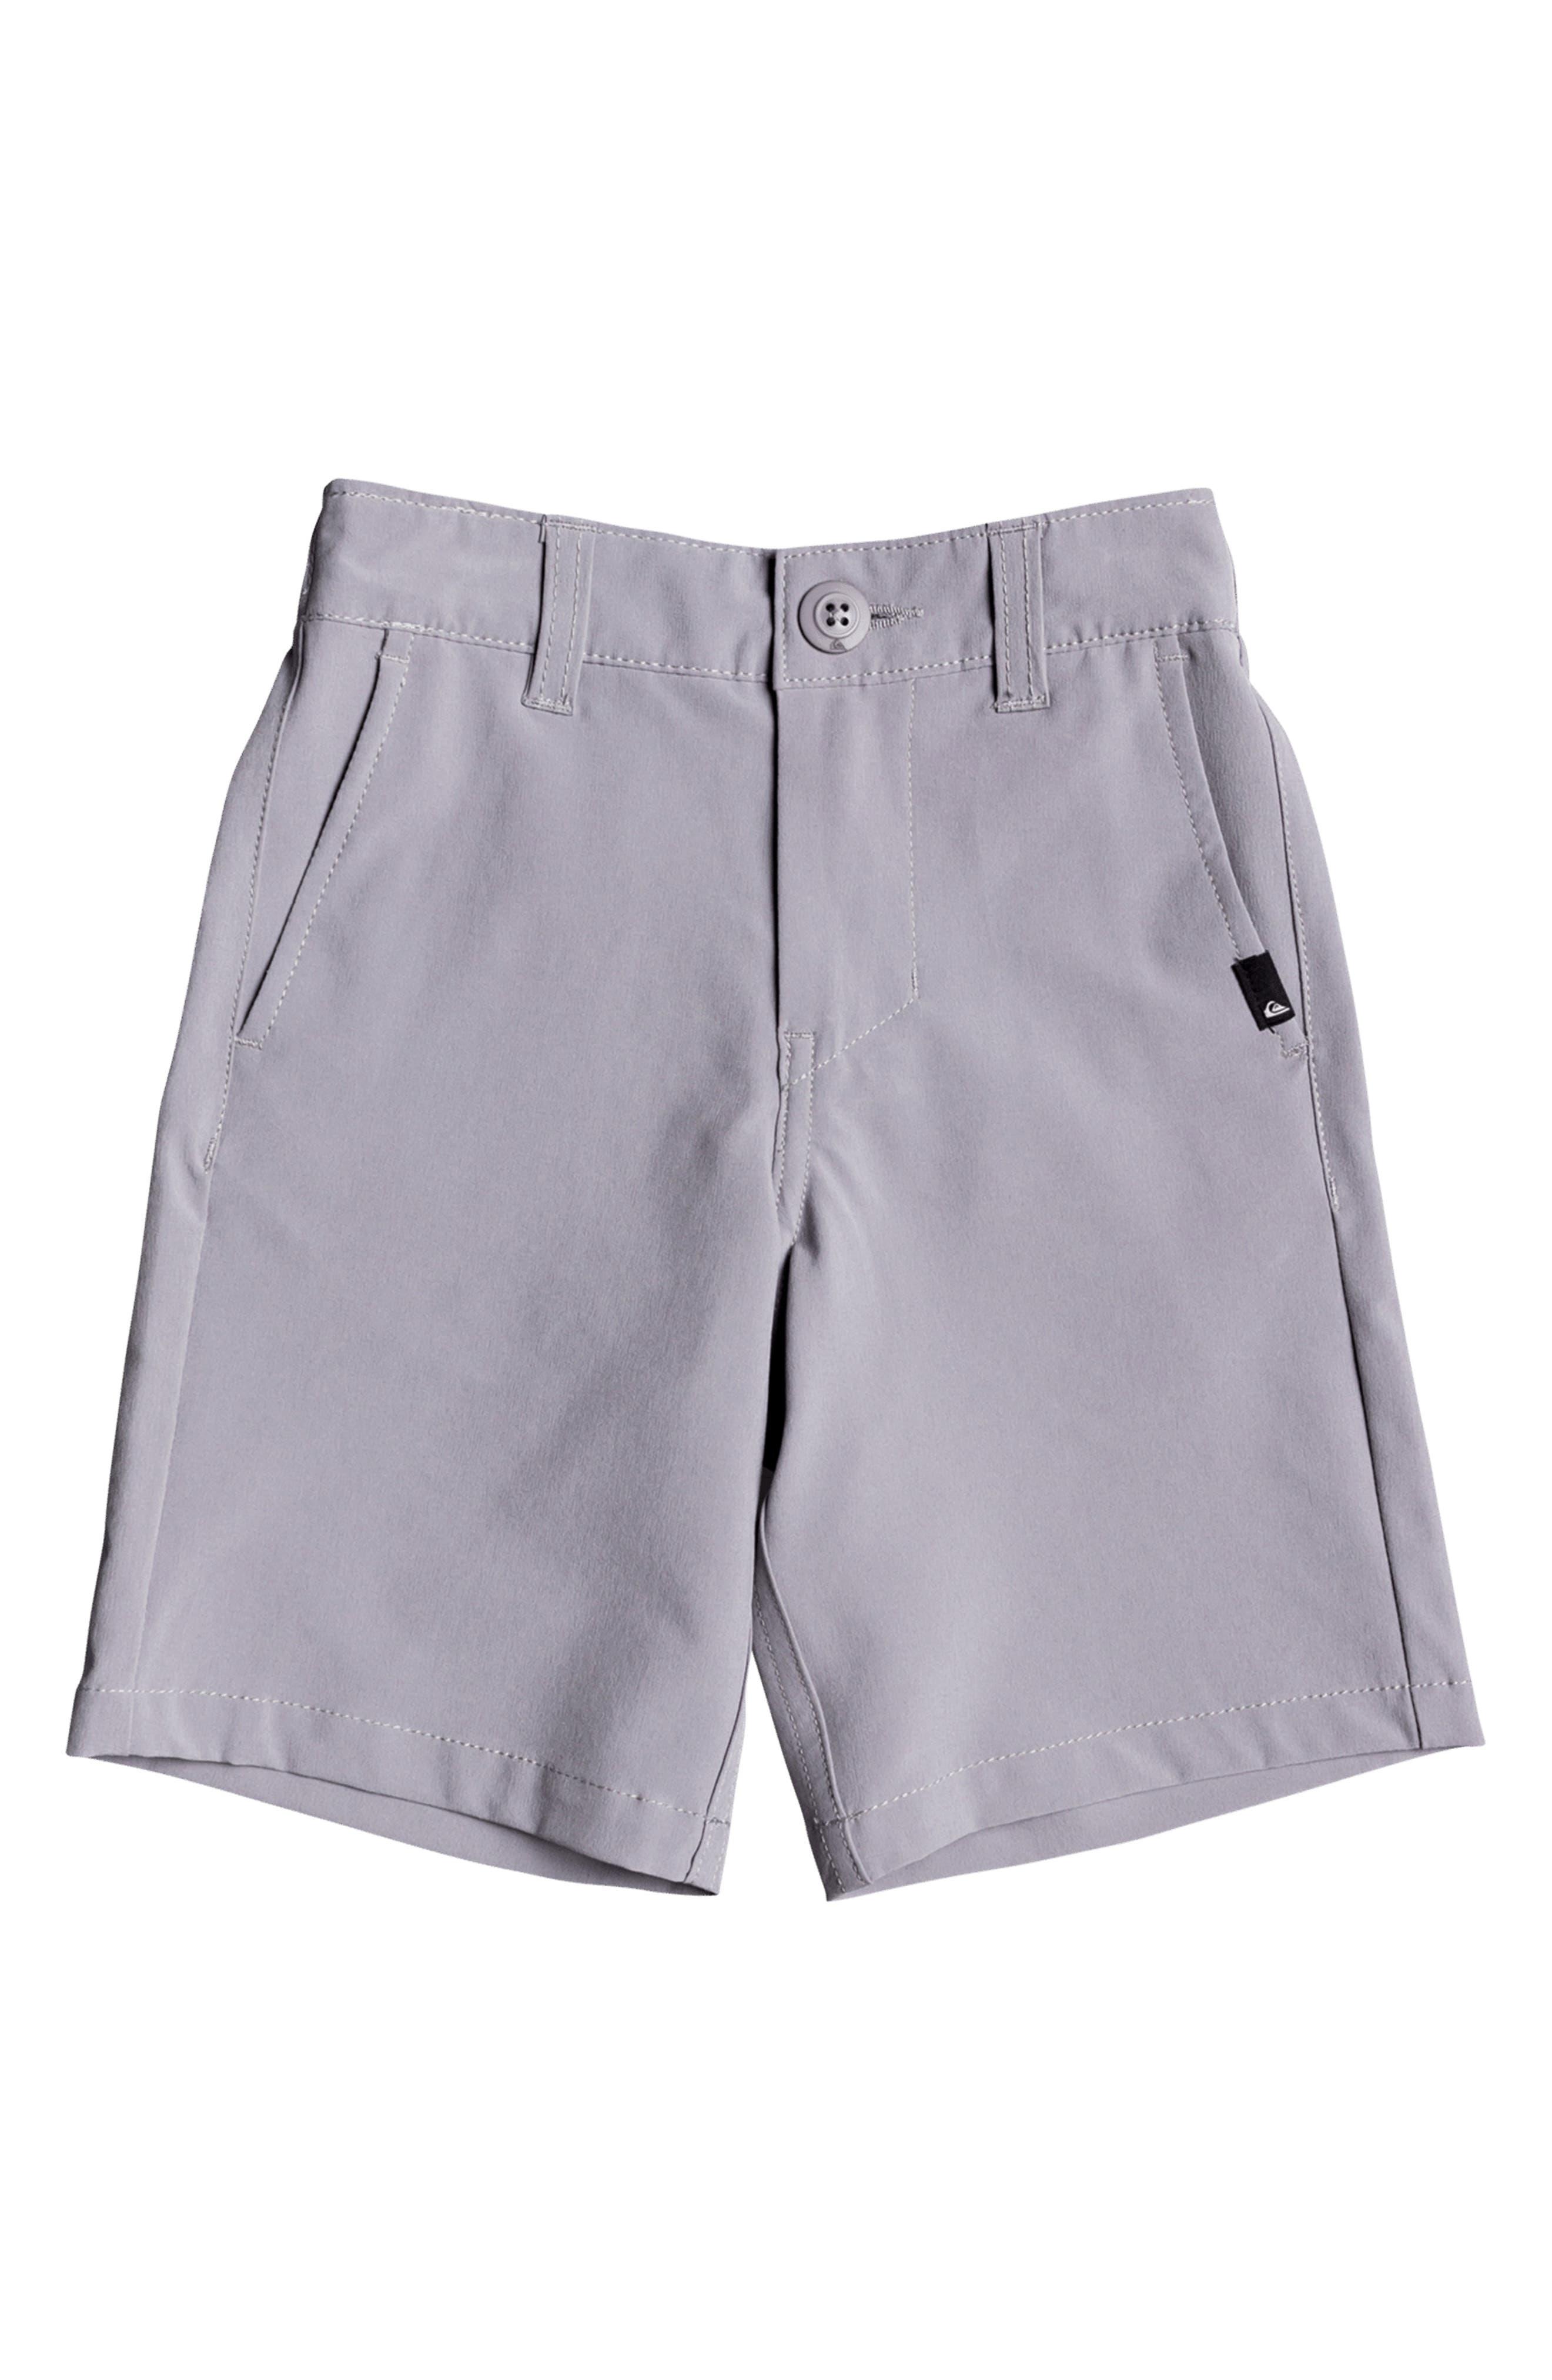 Quiksilver Boys Towel Short Youth Fleece Bottom Casual